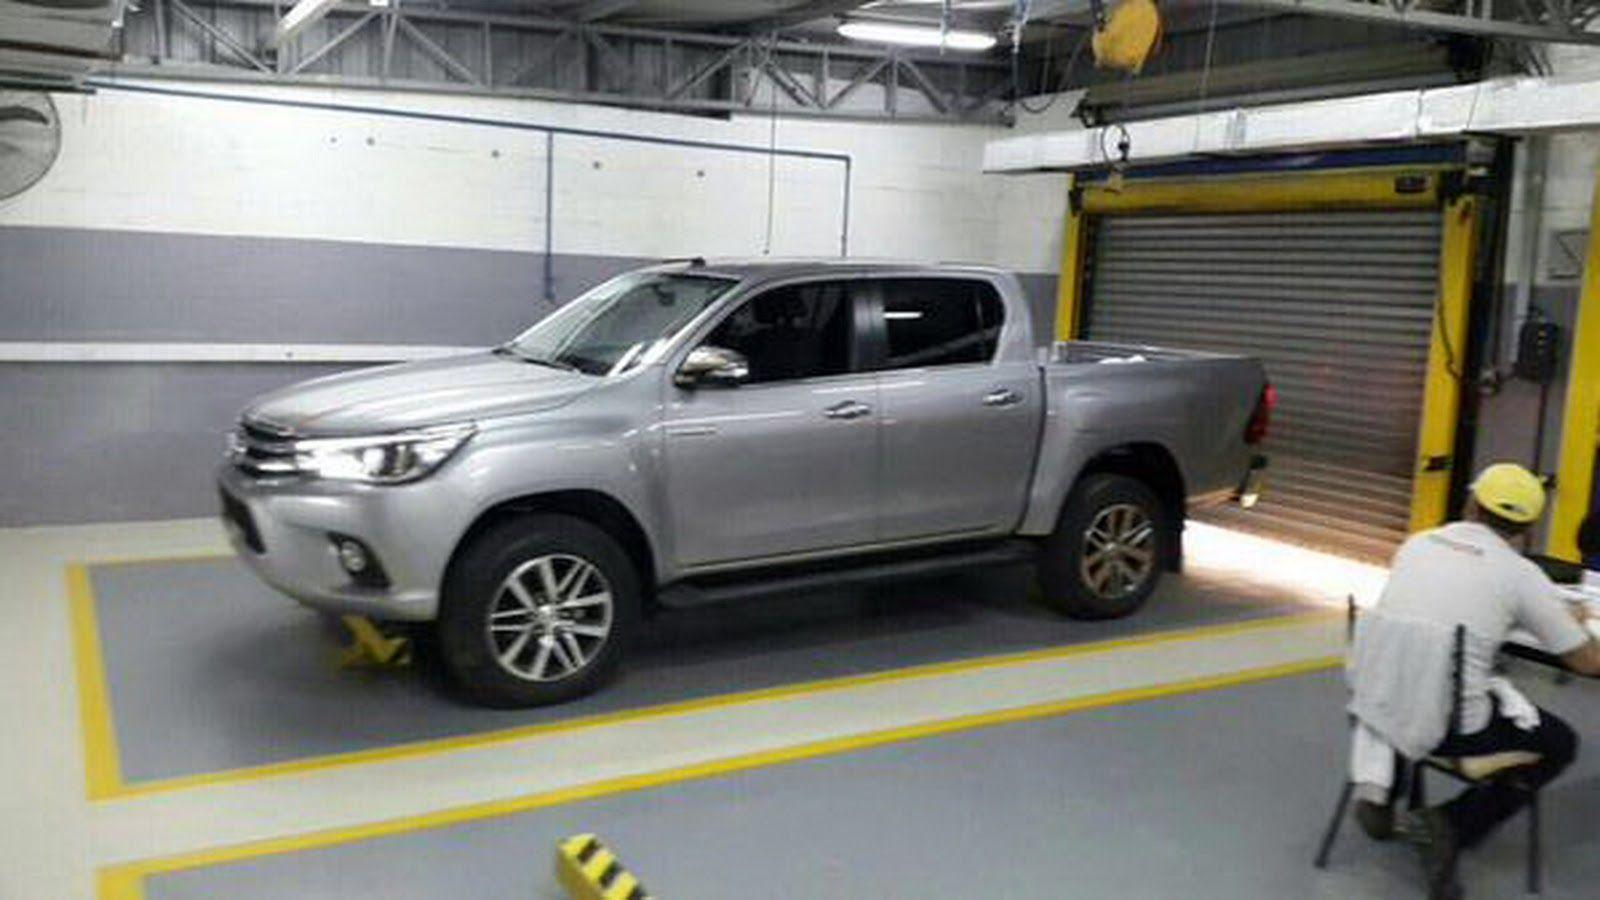 Toyota Hilux 2015 spyshots